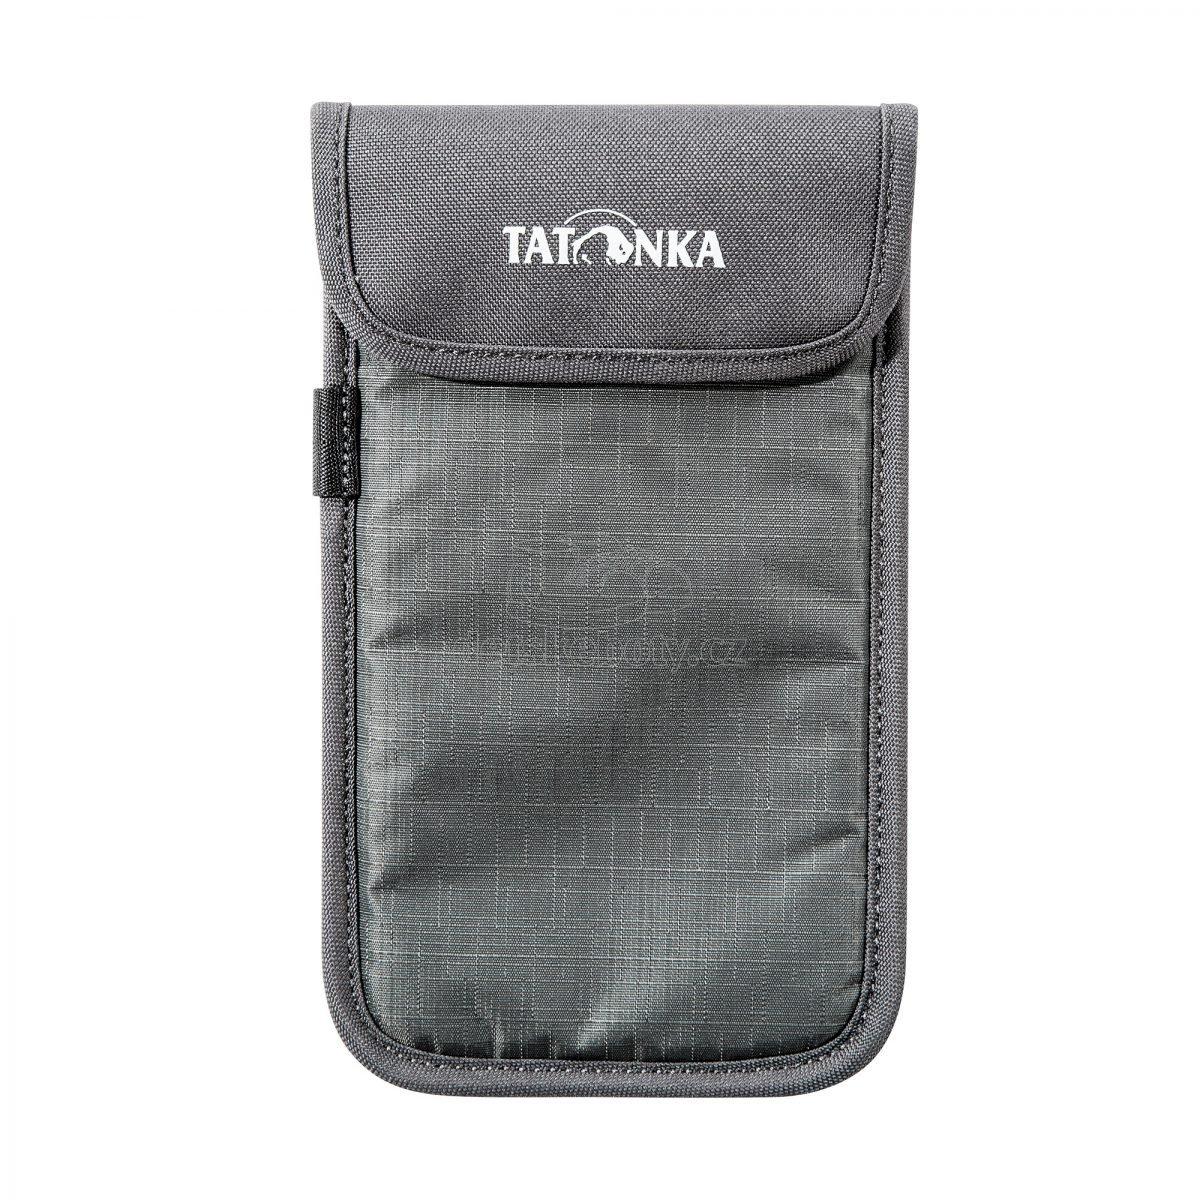 Tatonka Smartphone Case XL (titan grey)